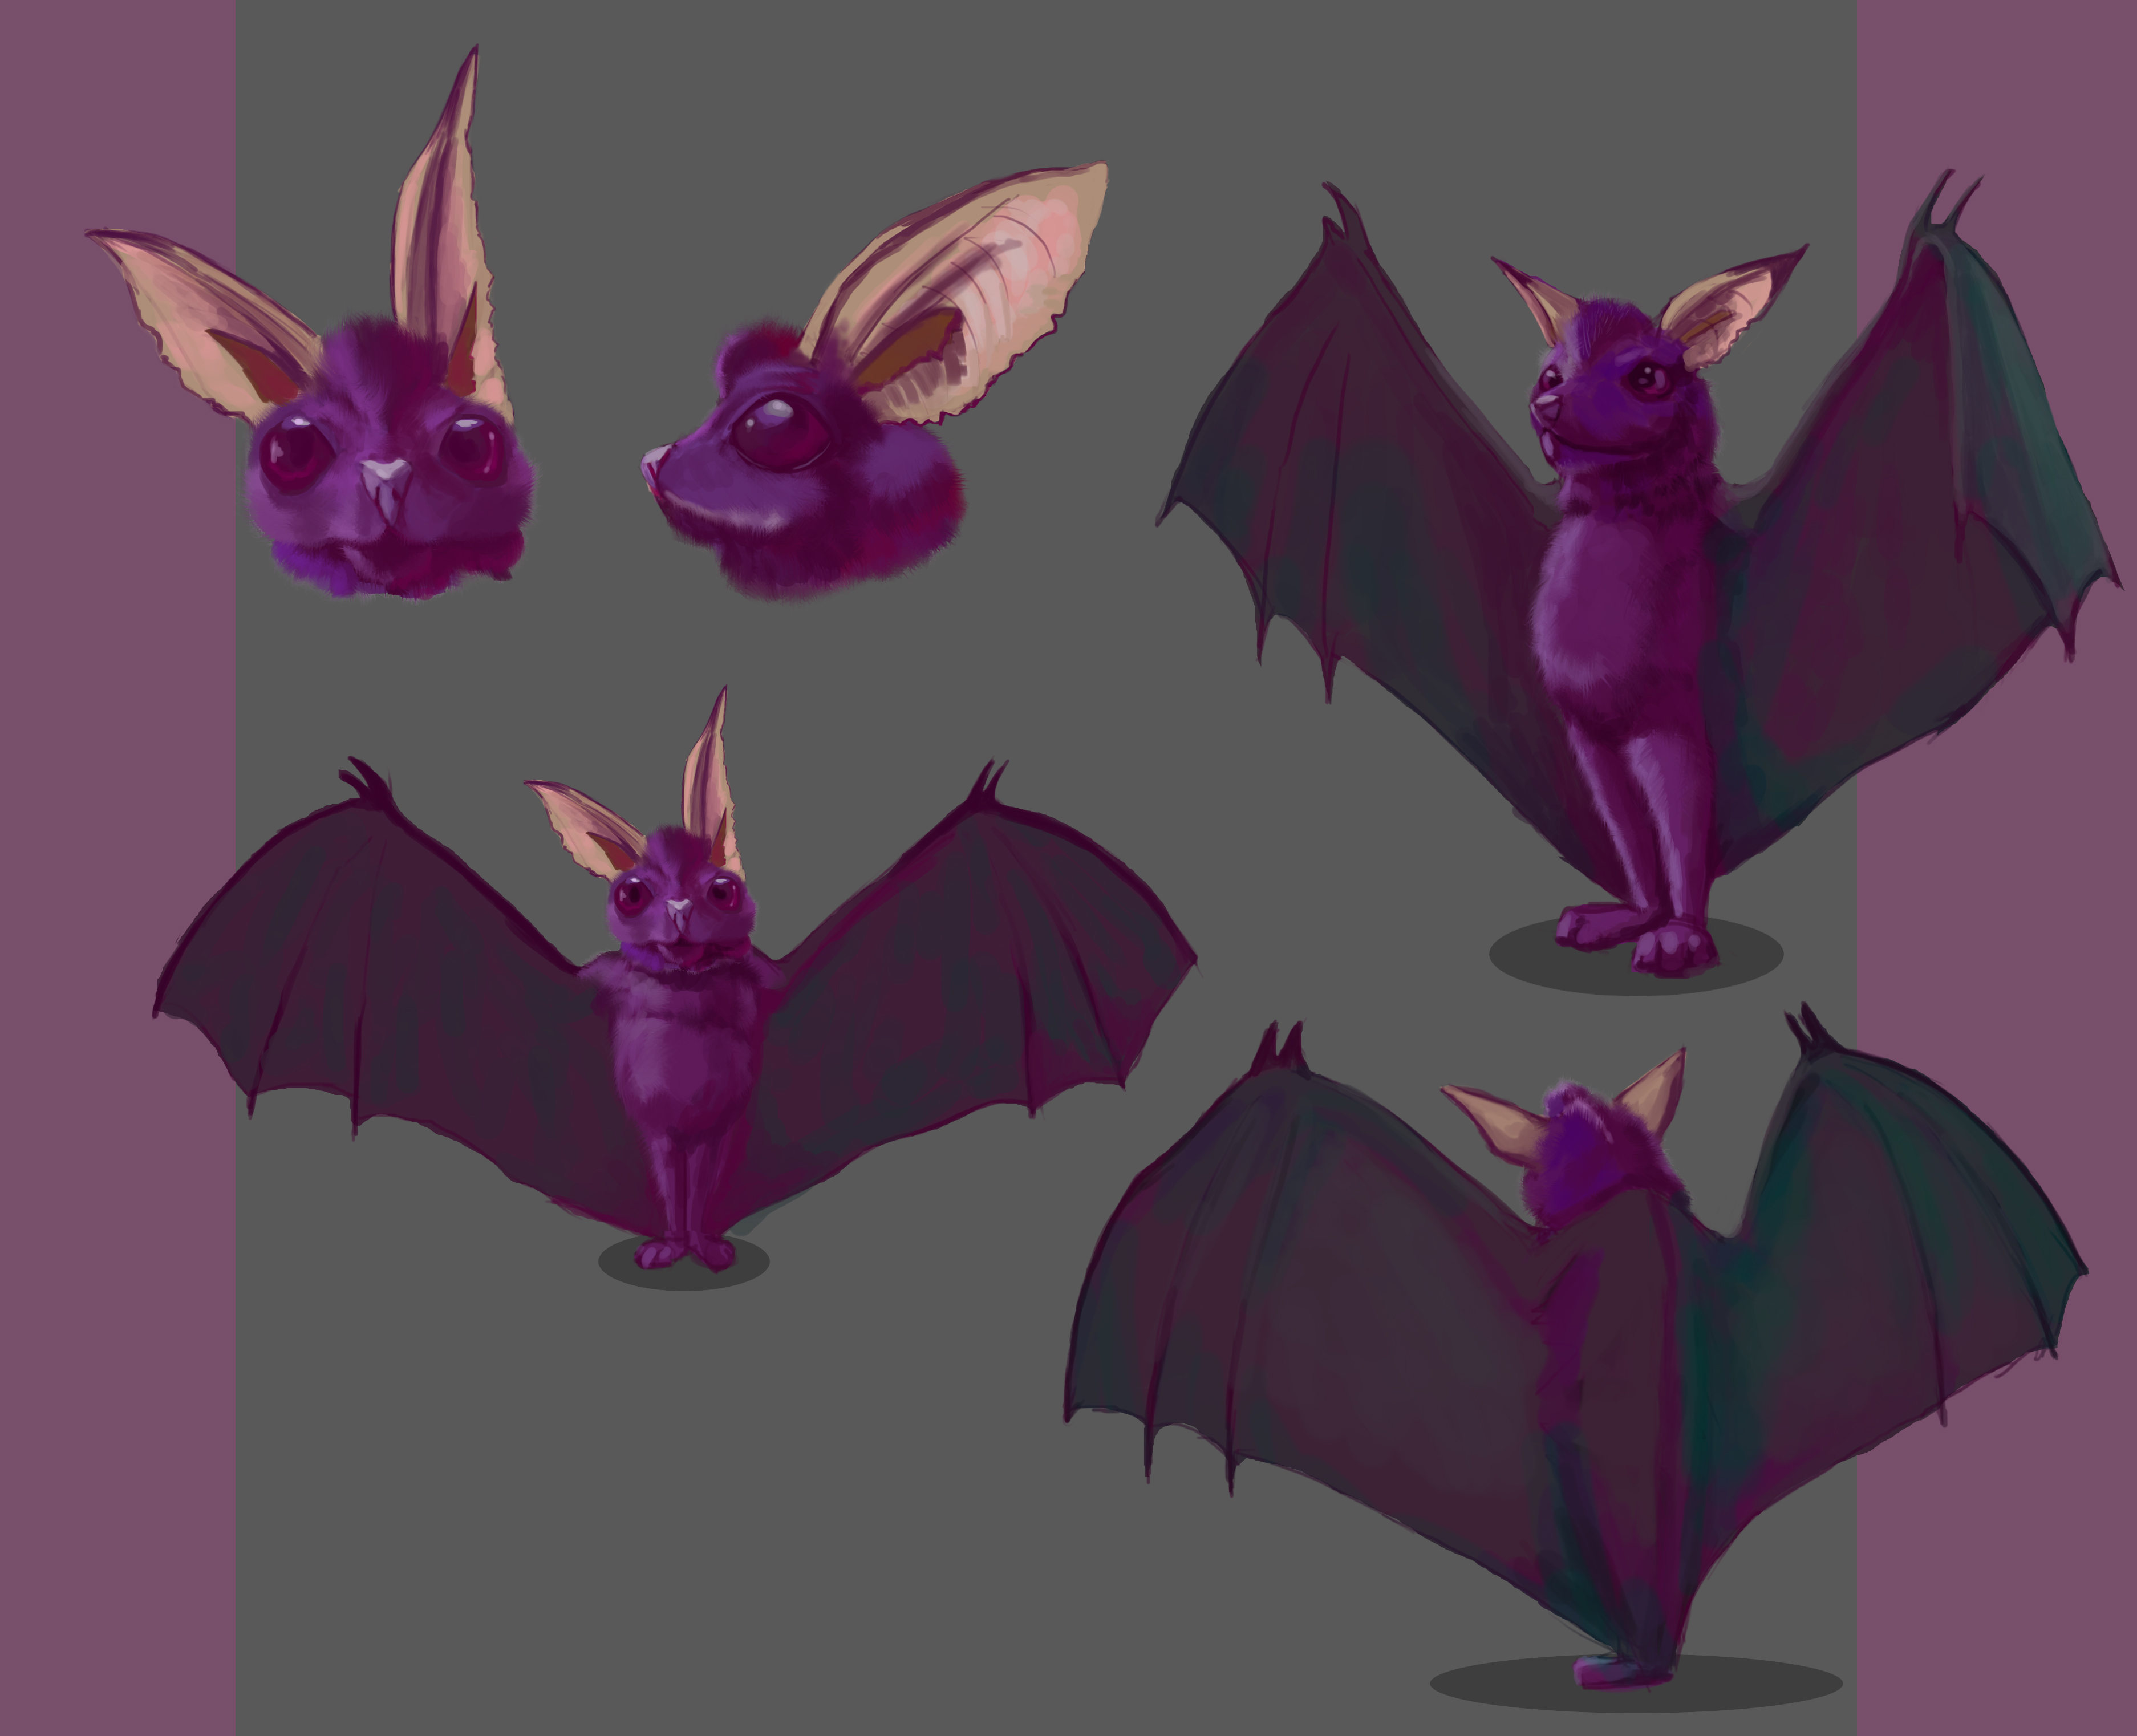 Нарисовать персонажа для анимации фото f_3765c9296d46d5eb.jpg